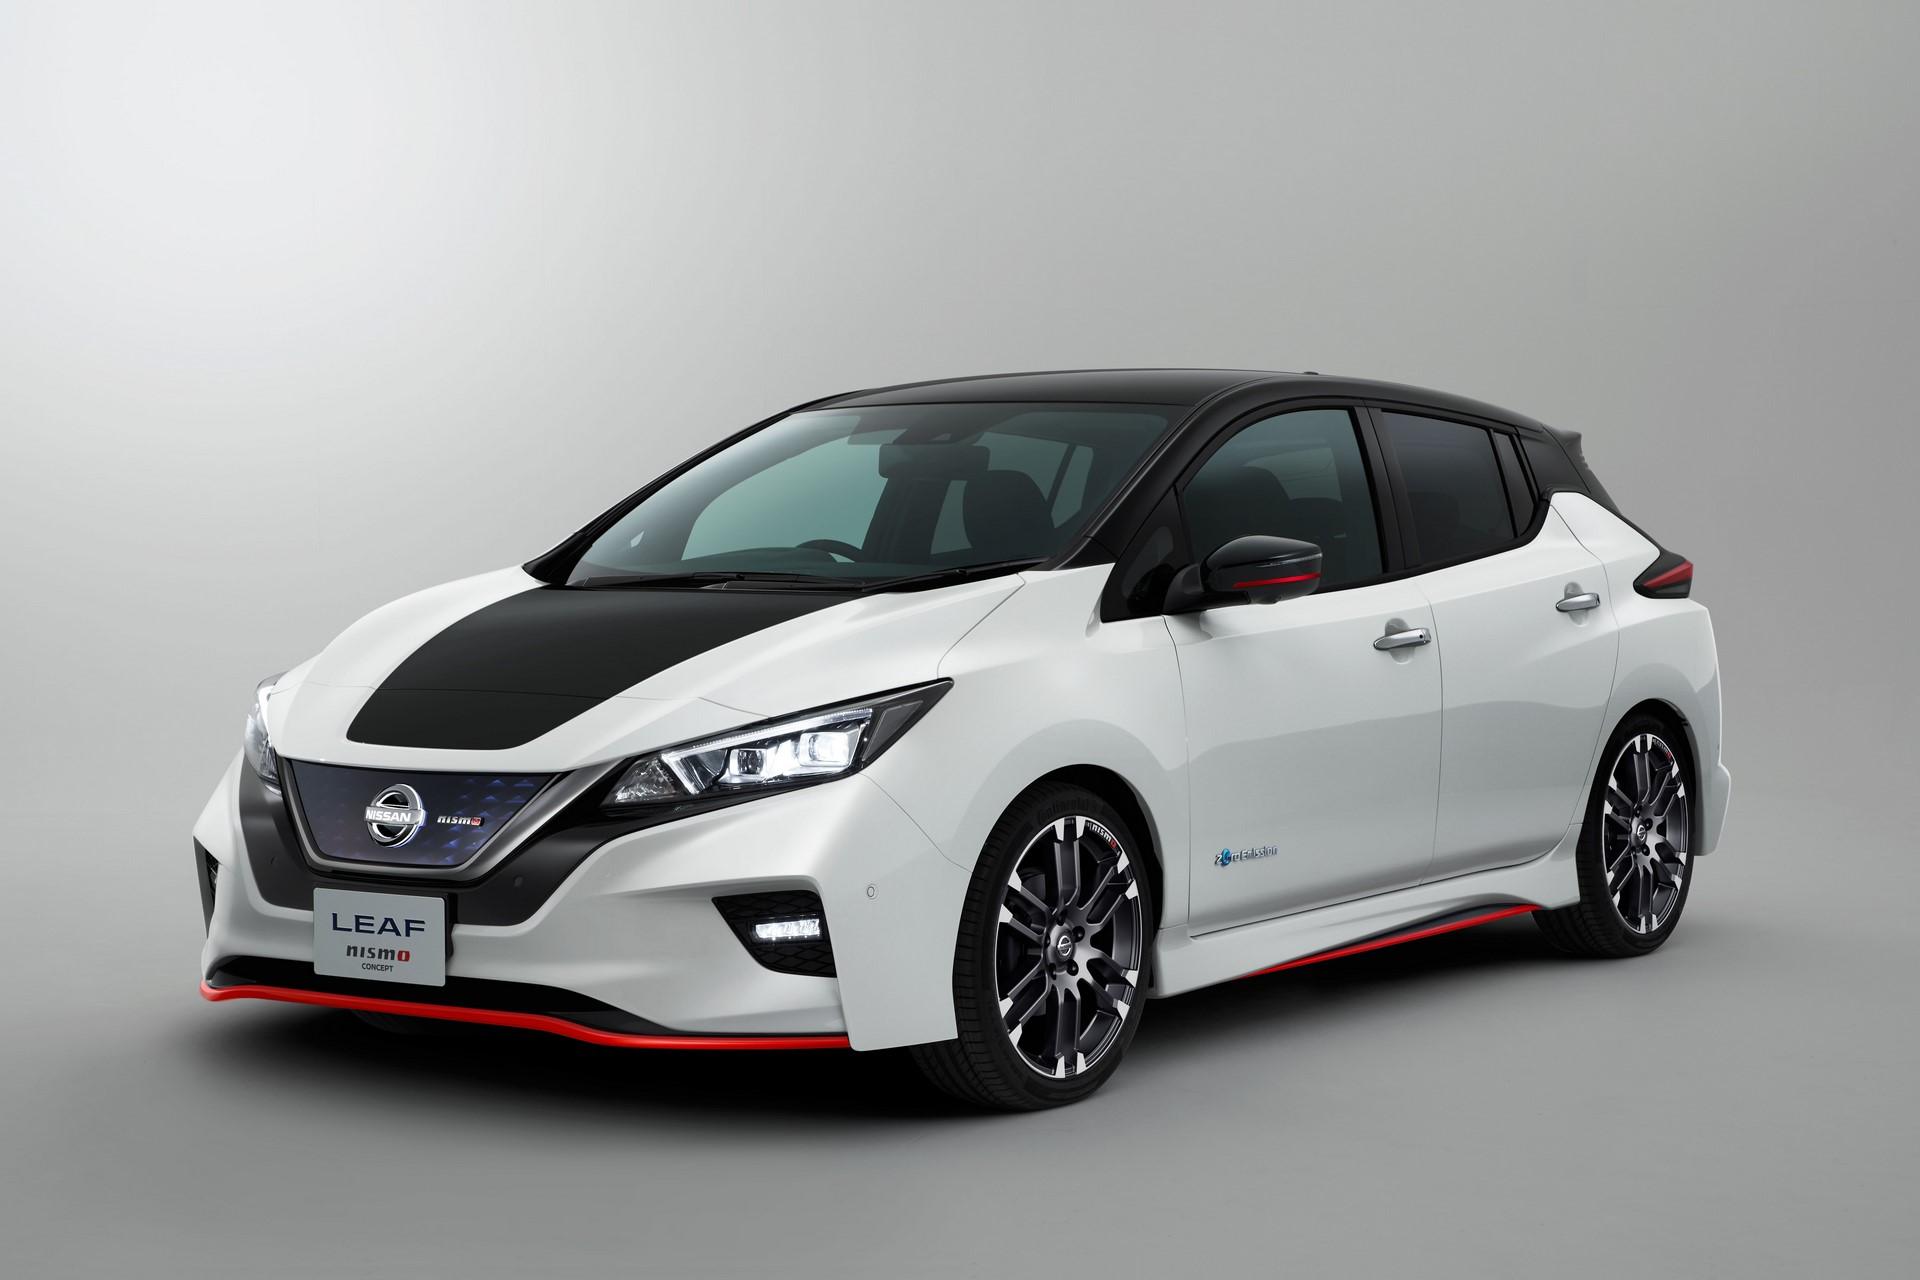 Nissan Leaf Nismo Concep (1)